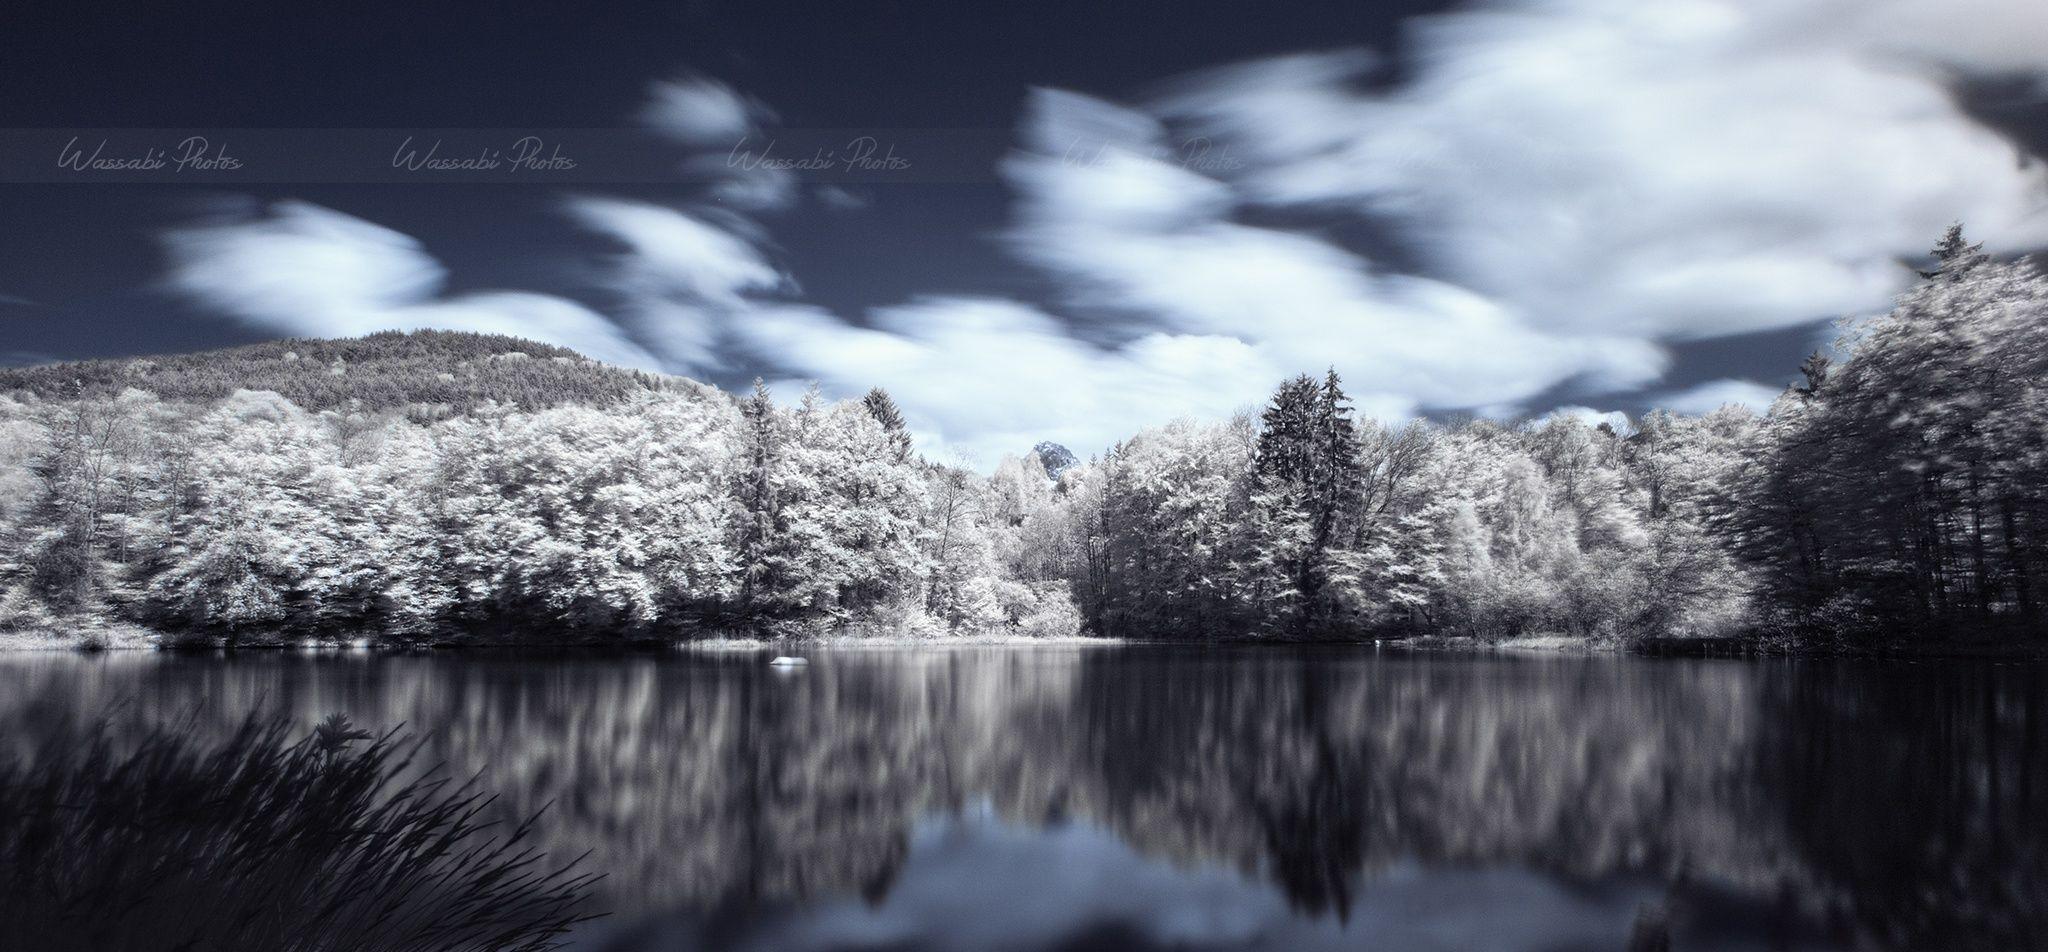 Fotografía Reflection Beunaz Lake (France) por Wassabi Photos en 500px Descripción: Lago Beunaz, situado en el departamento de Haute-Savoie, Francia.